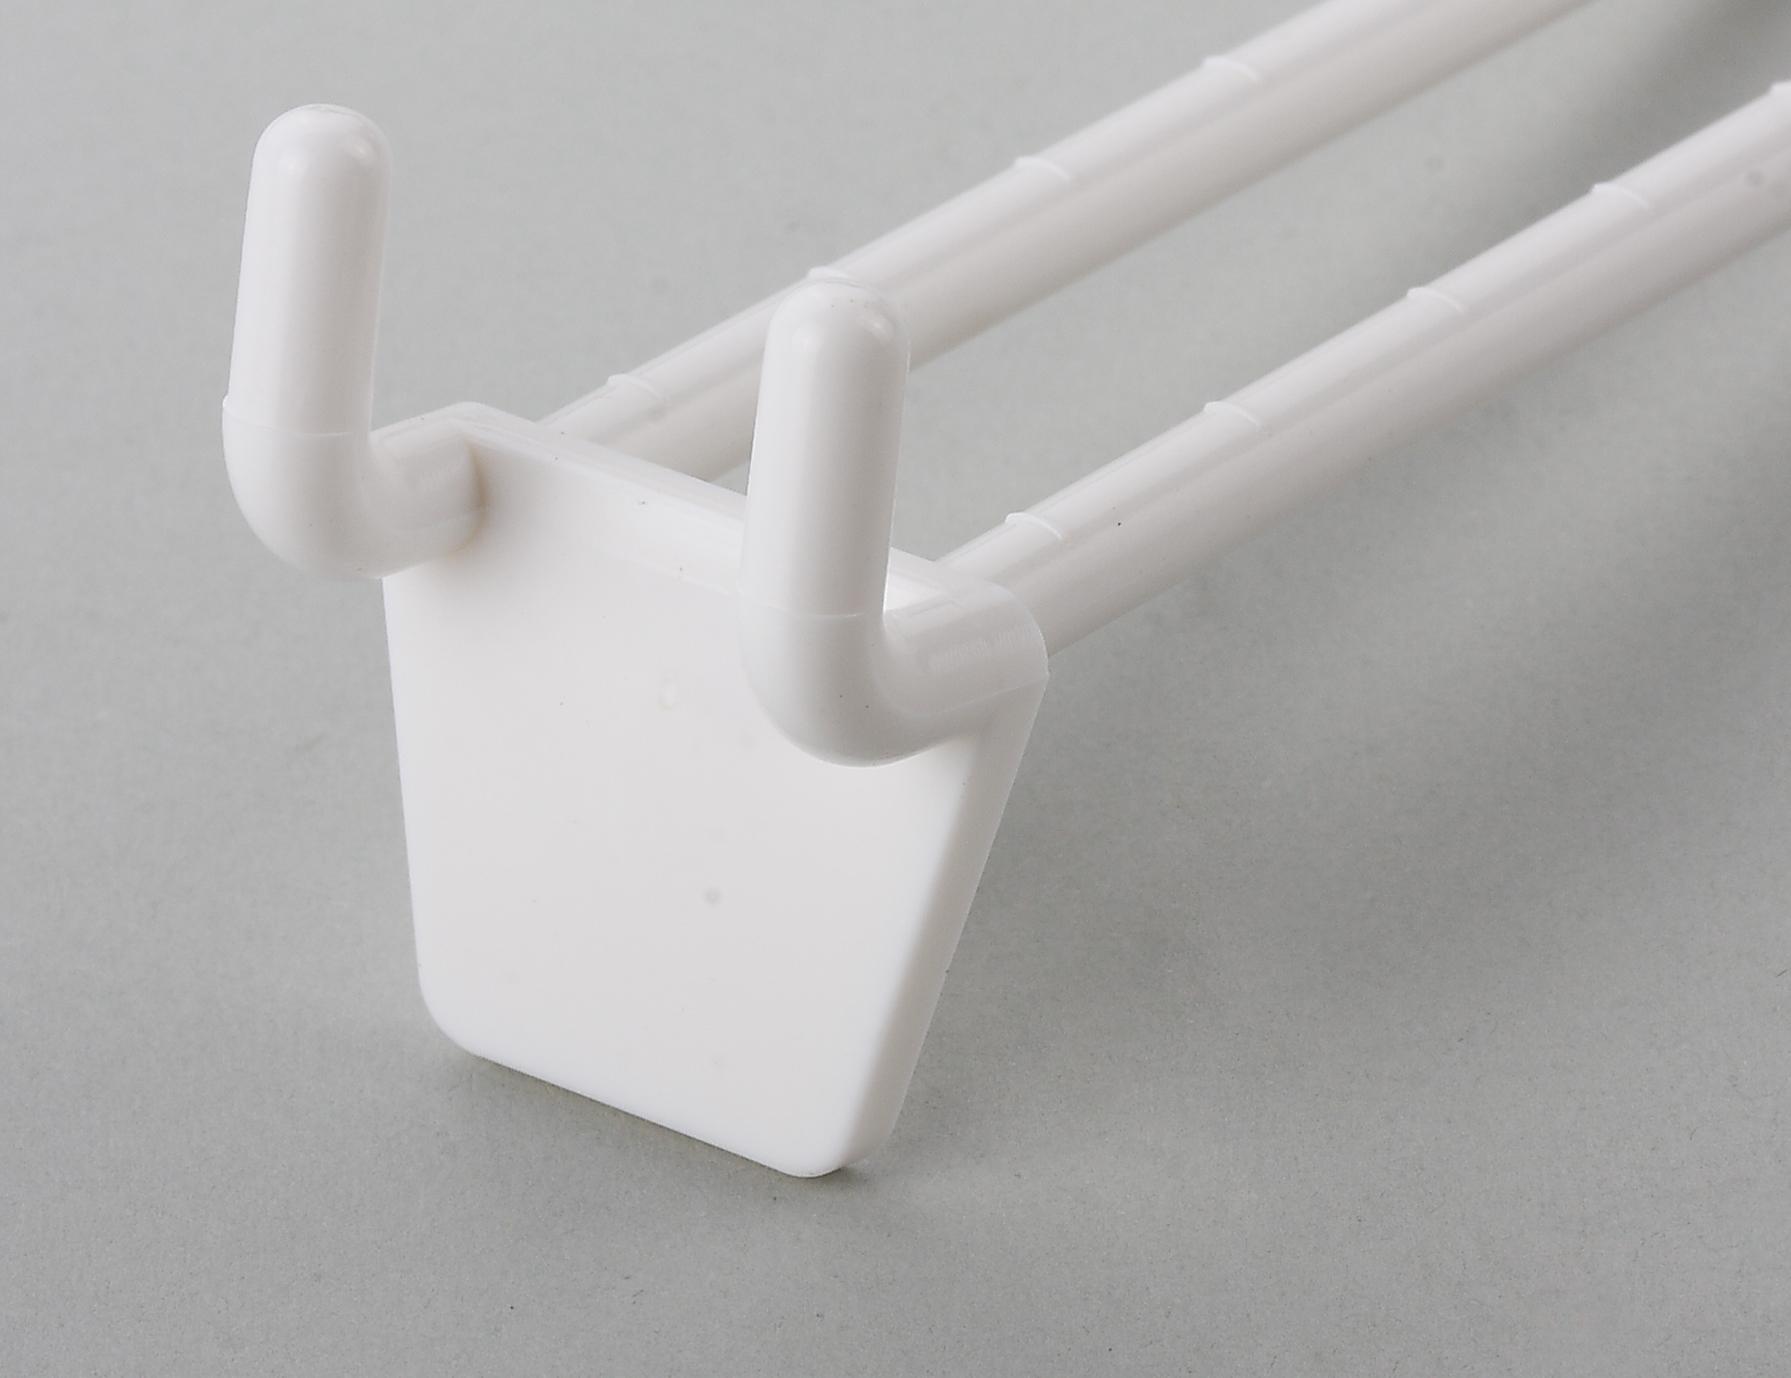 Loop Double Peg Chrome Coated Anti-sagging Grooved Ridged Hooks